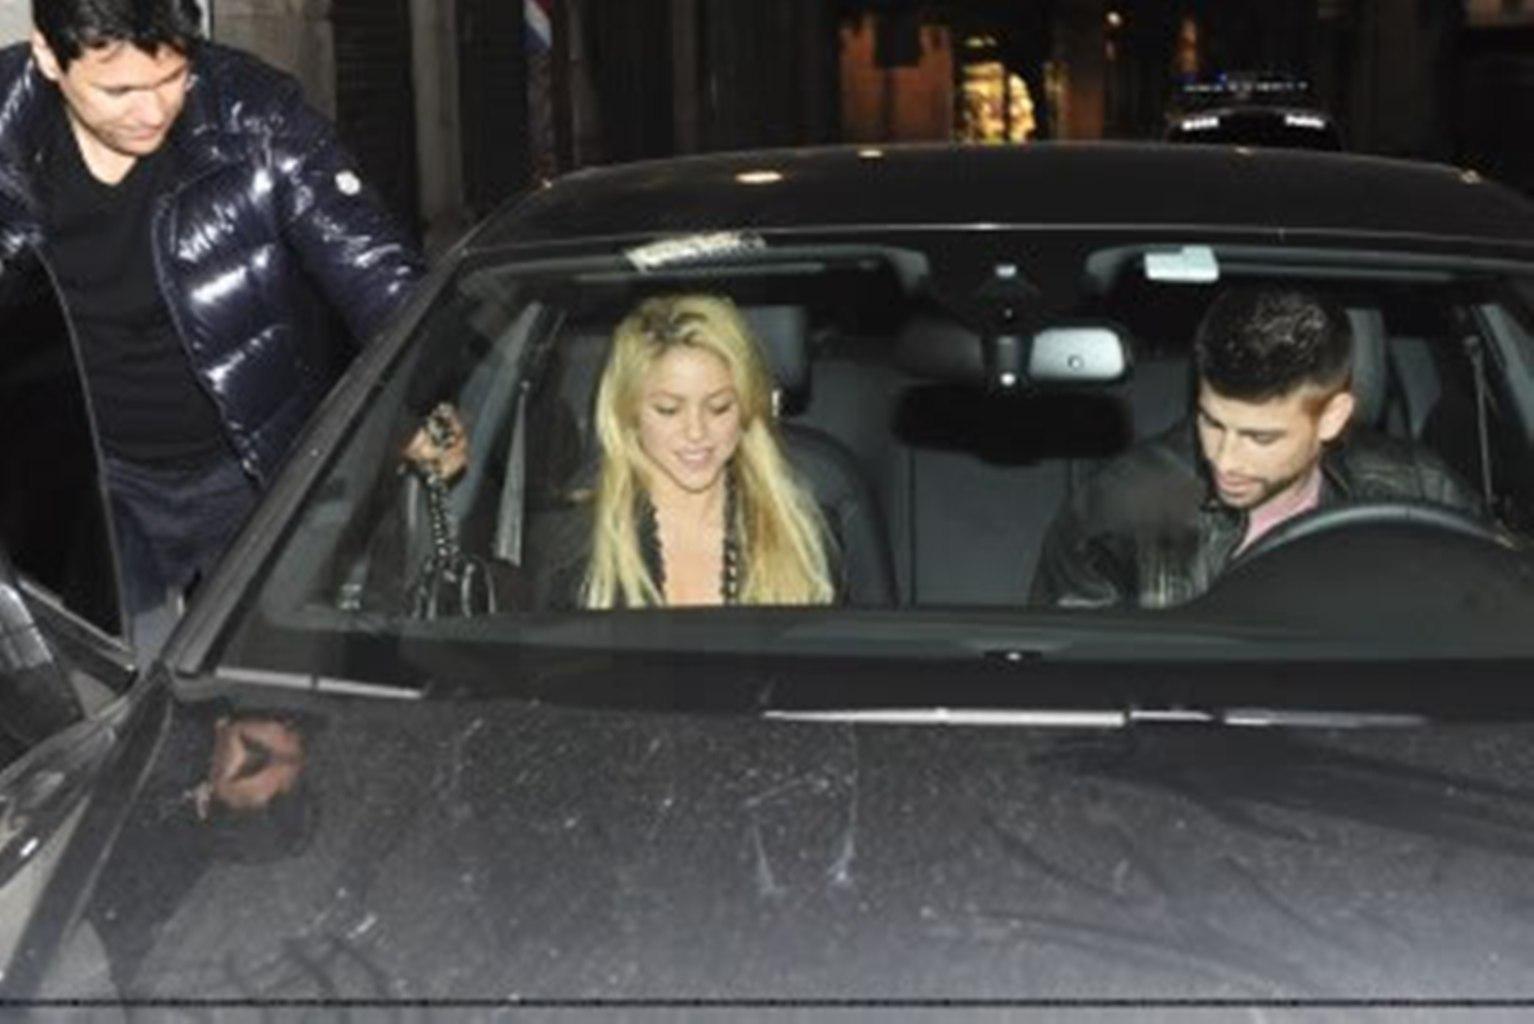 Shakira and Pique. - Page 2 Gerard-Piqu-Shakira-and-brother-gerard-pique-19520955-1534-1024